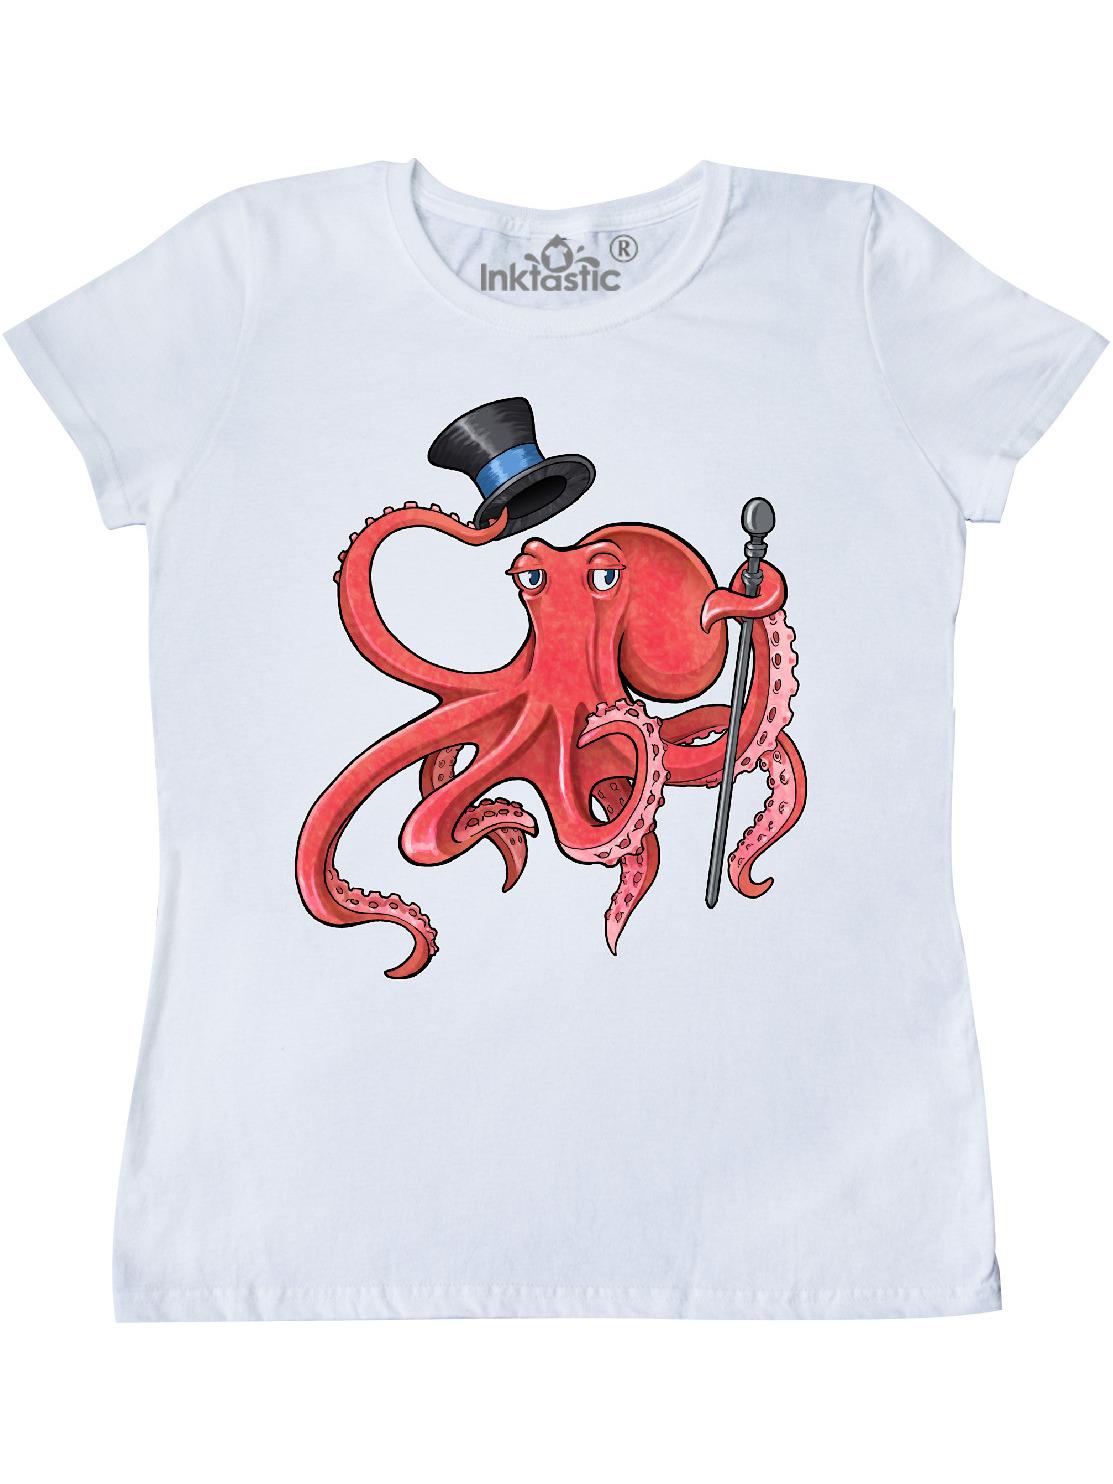 Pacific Ocean Giant Pacific Octopus Steampunk Vintage Women/'sMen/'s TShirt